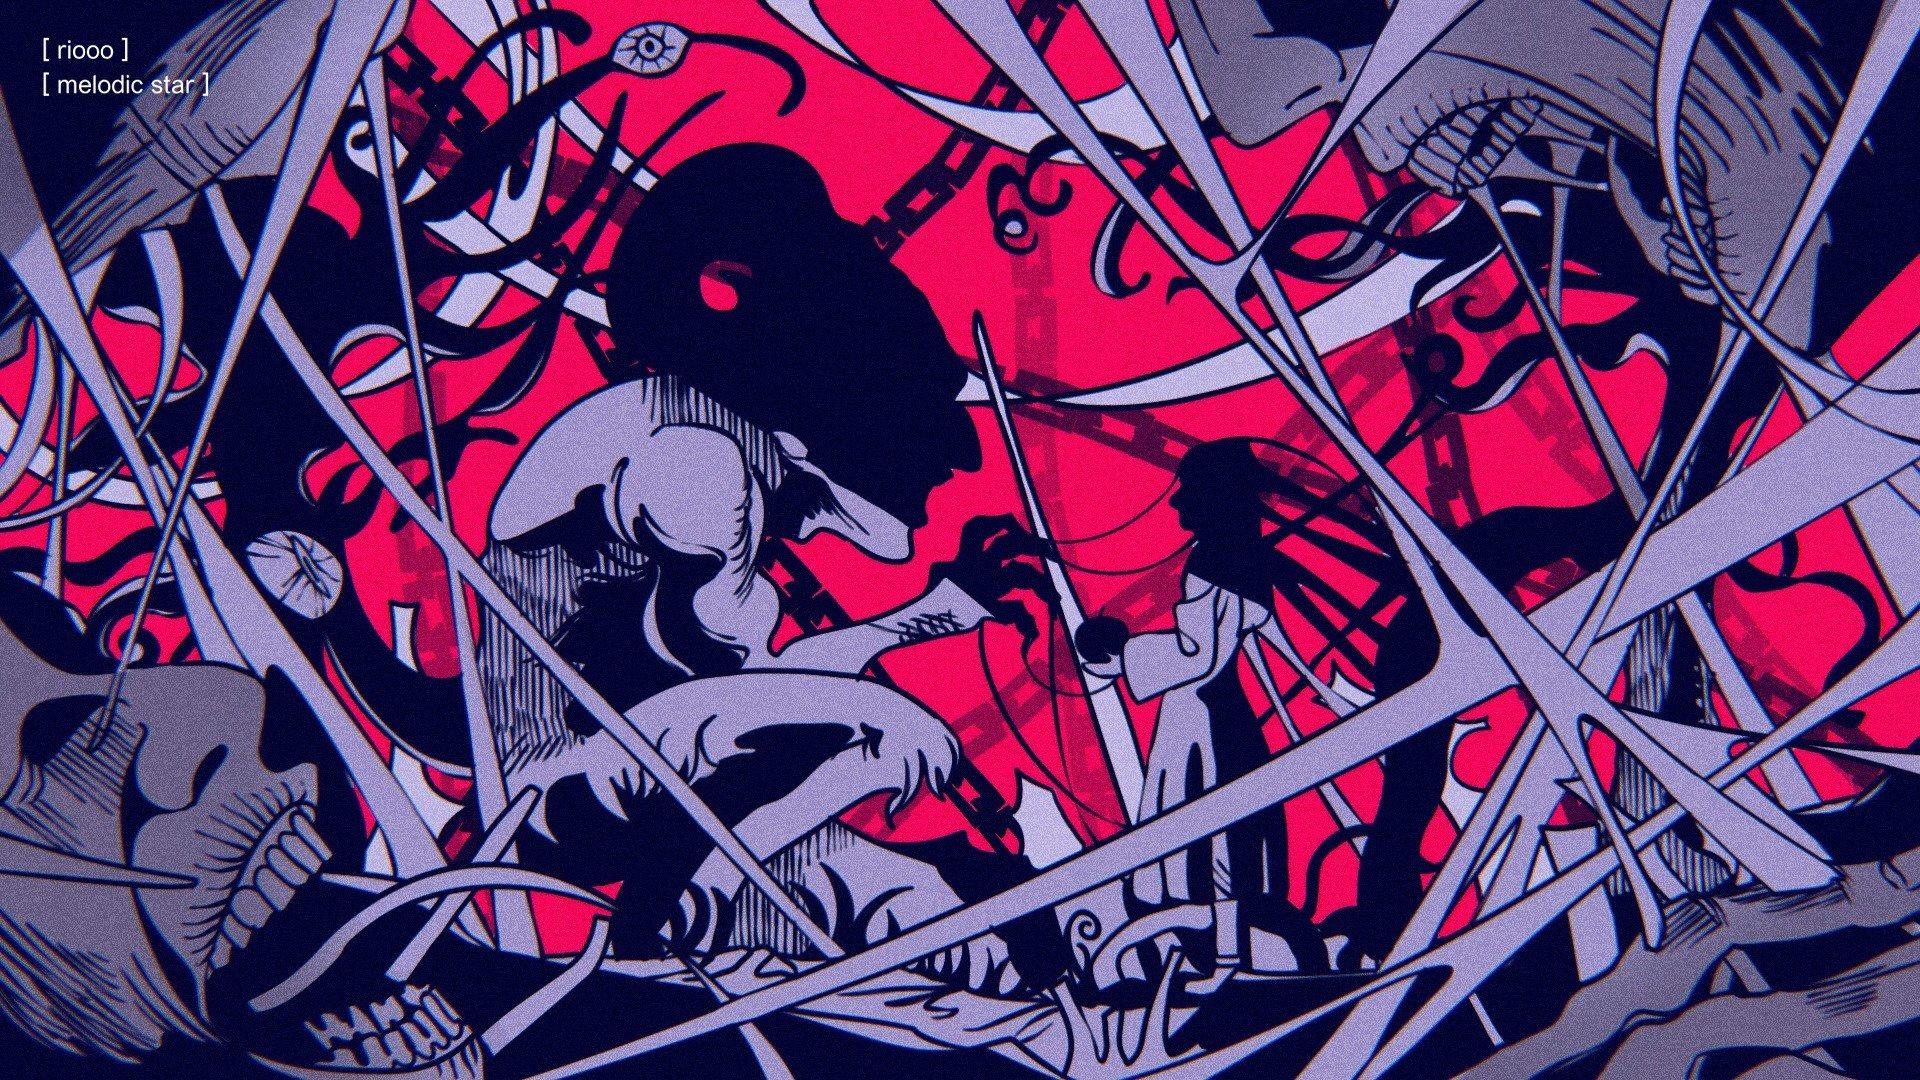 Ymir Hd Wallpaper Background Image 1920x1080 Id 1023407 Wallpaper Abyss